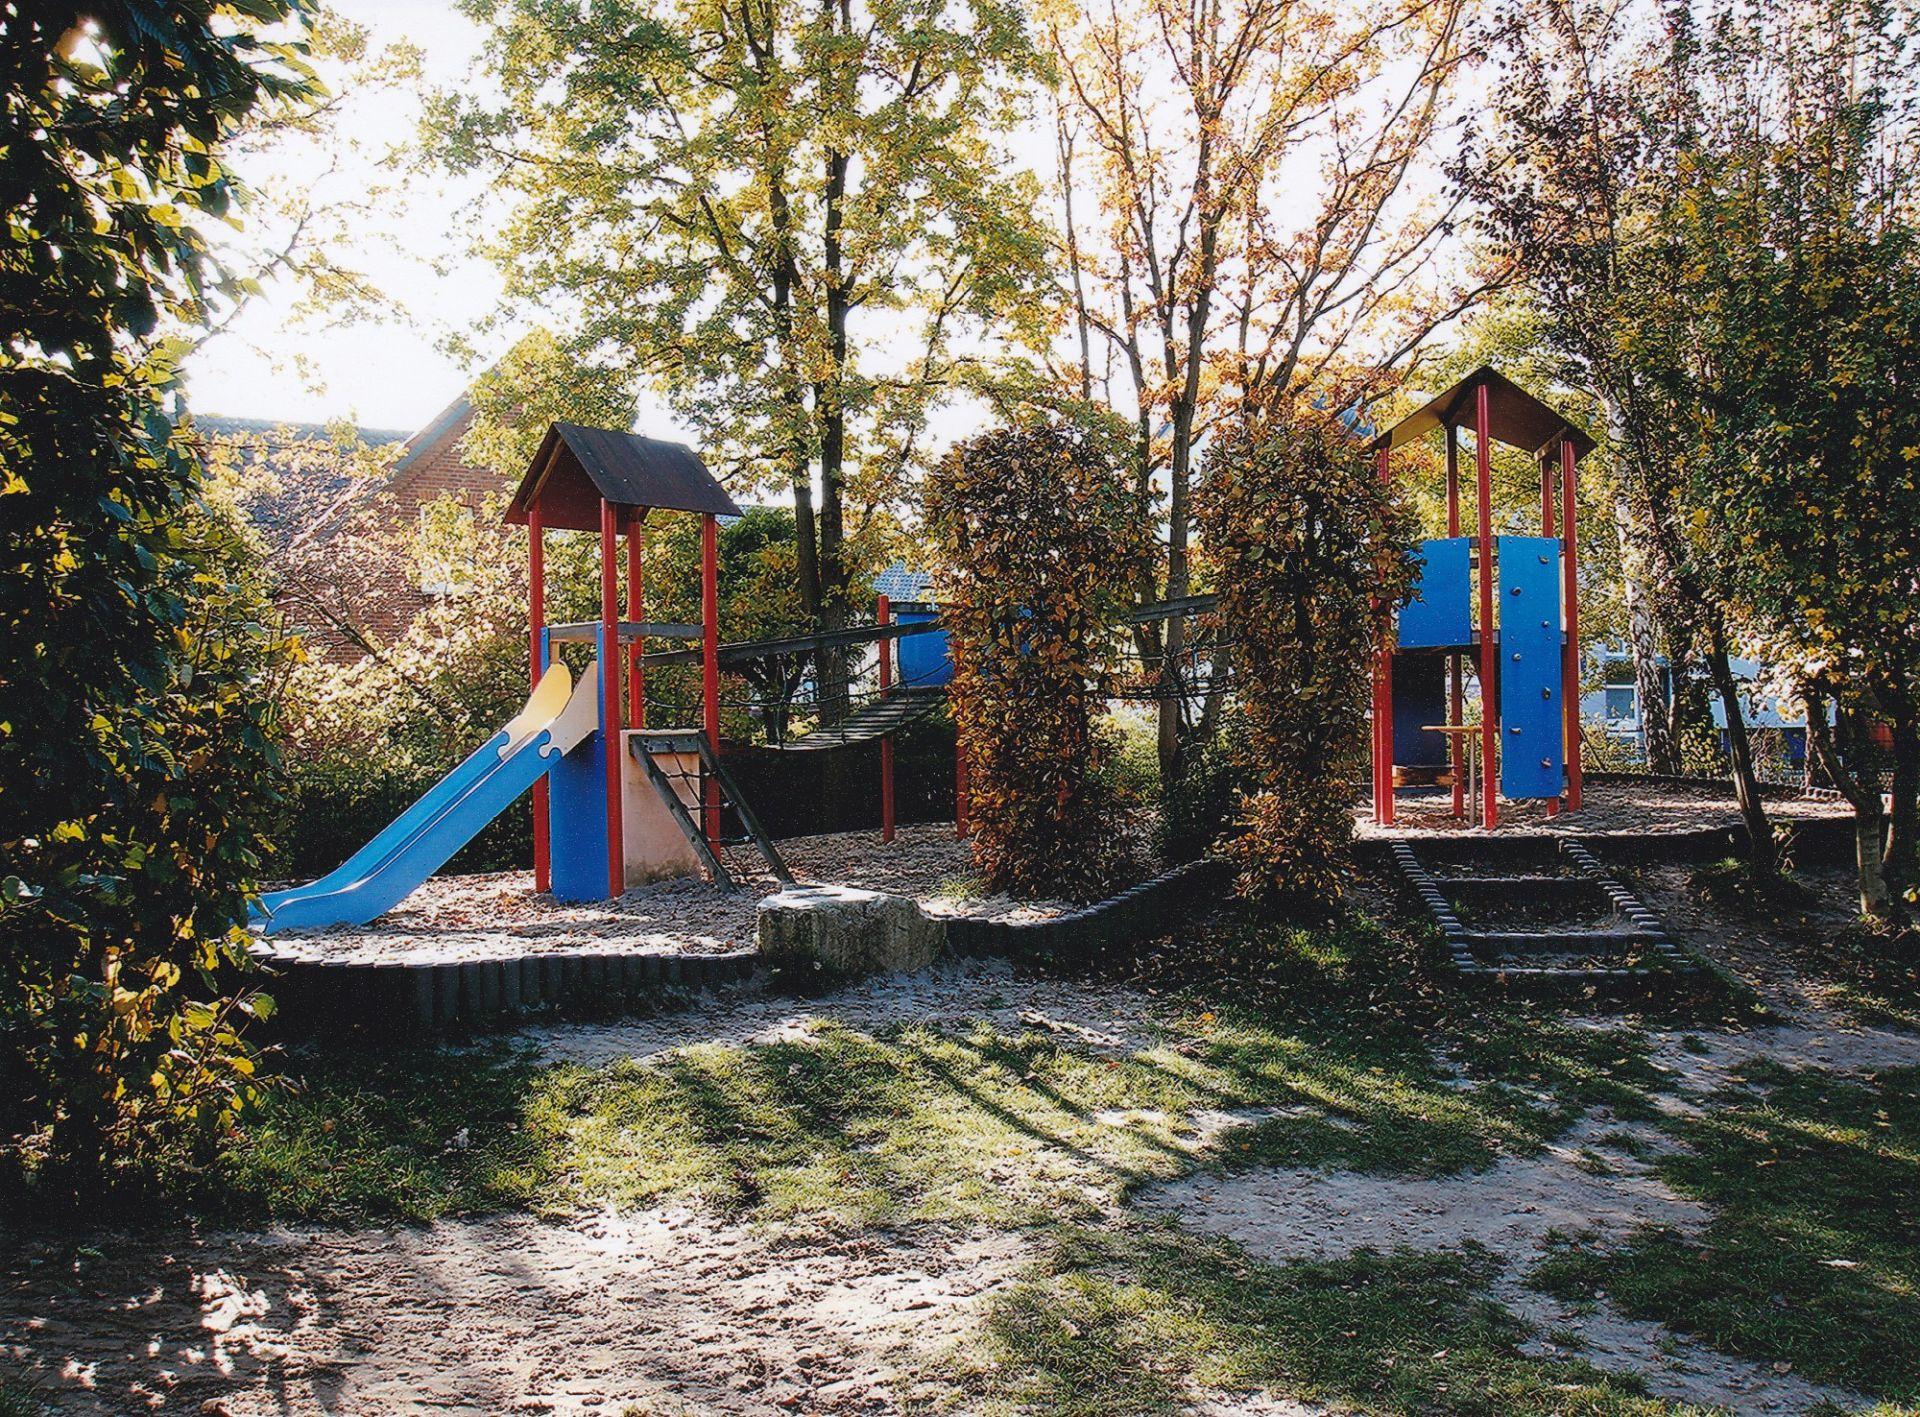 Klettergerüst Kindergarten Outdoor : Sommerfest im ossenberger kindergarten rheinberg